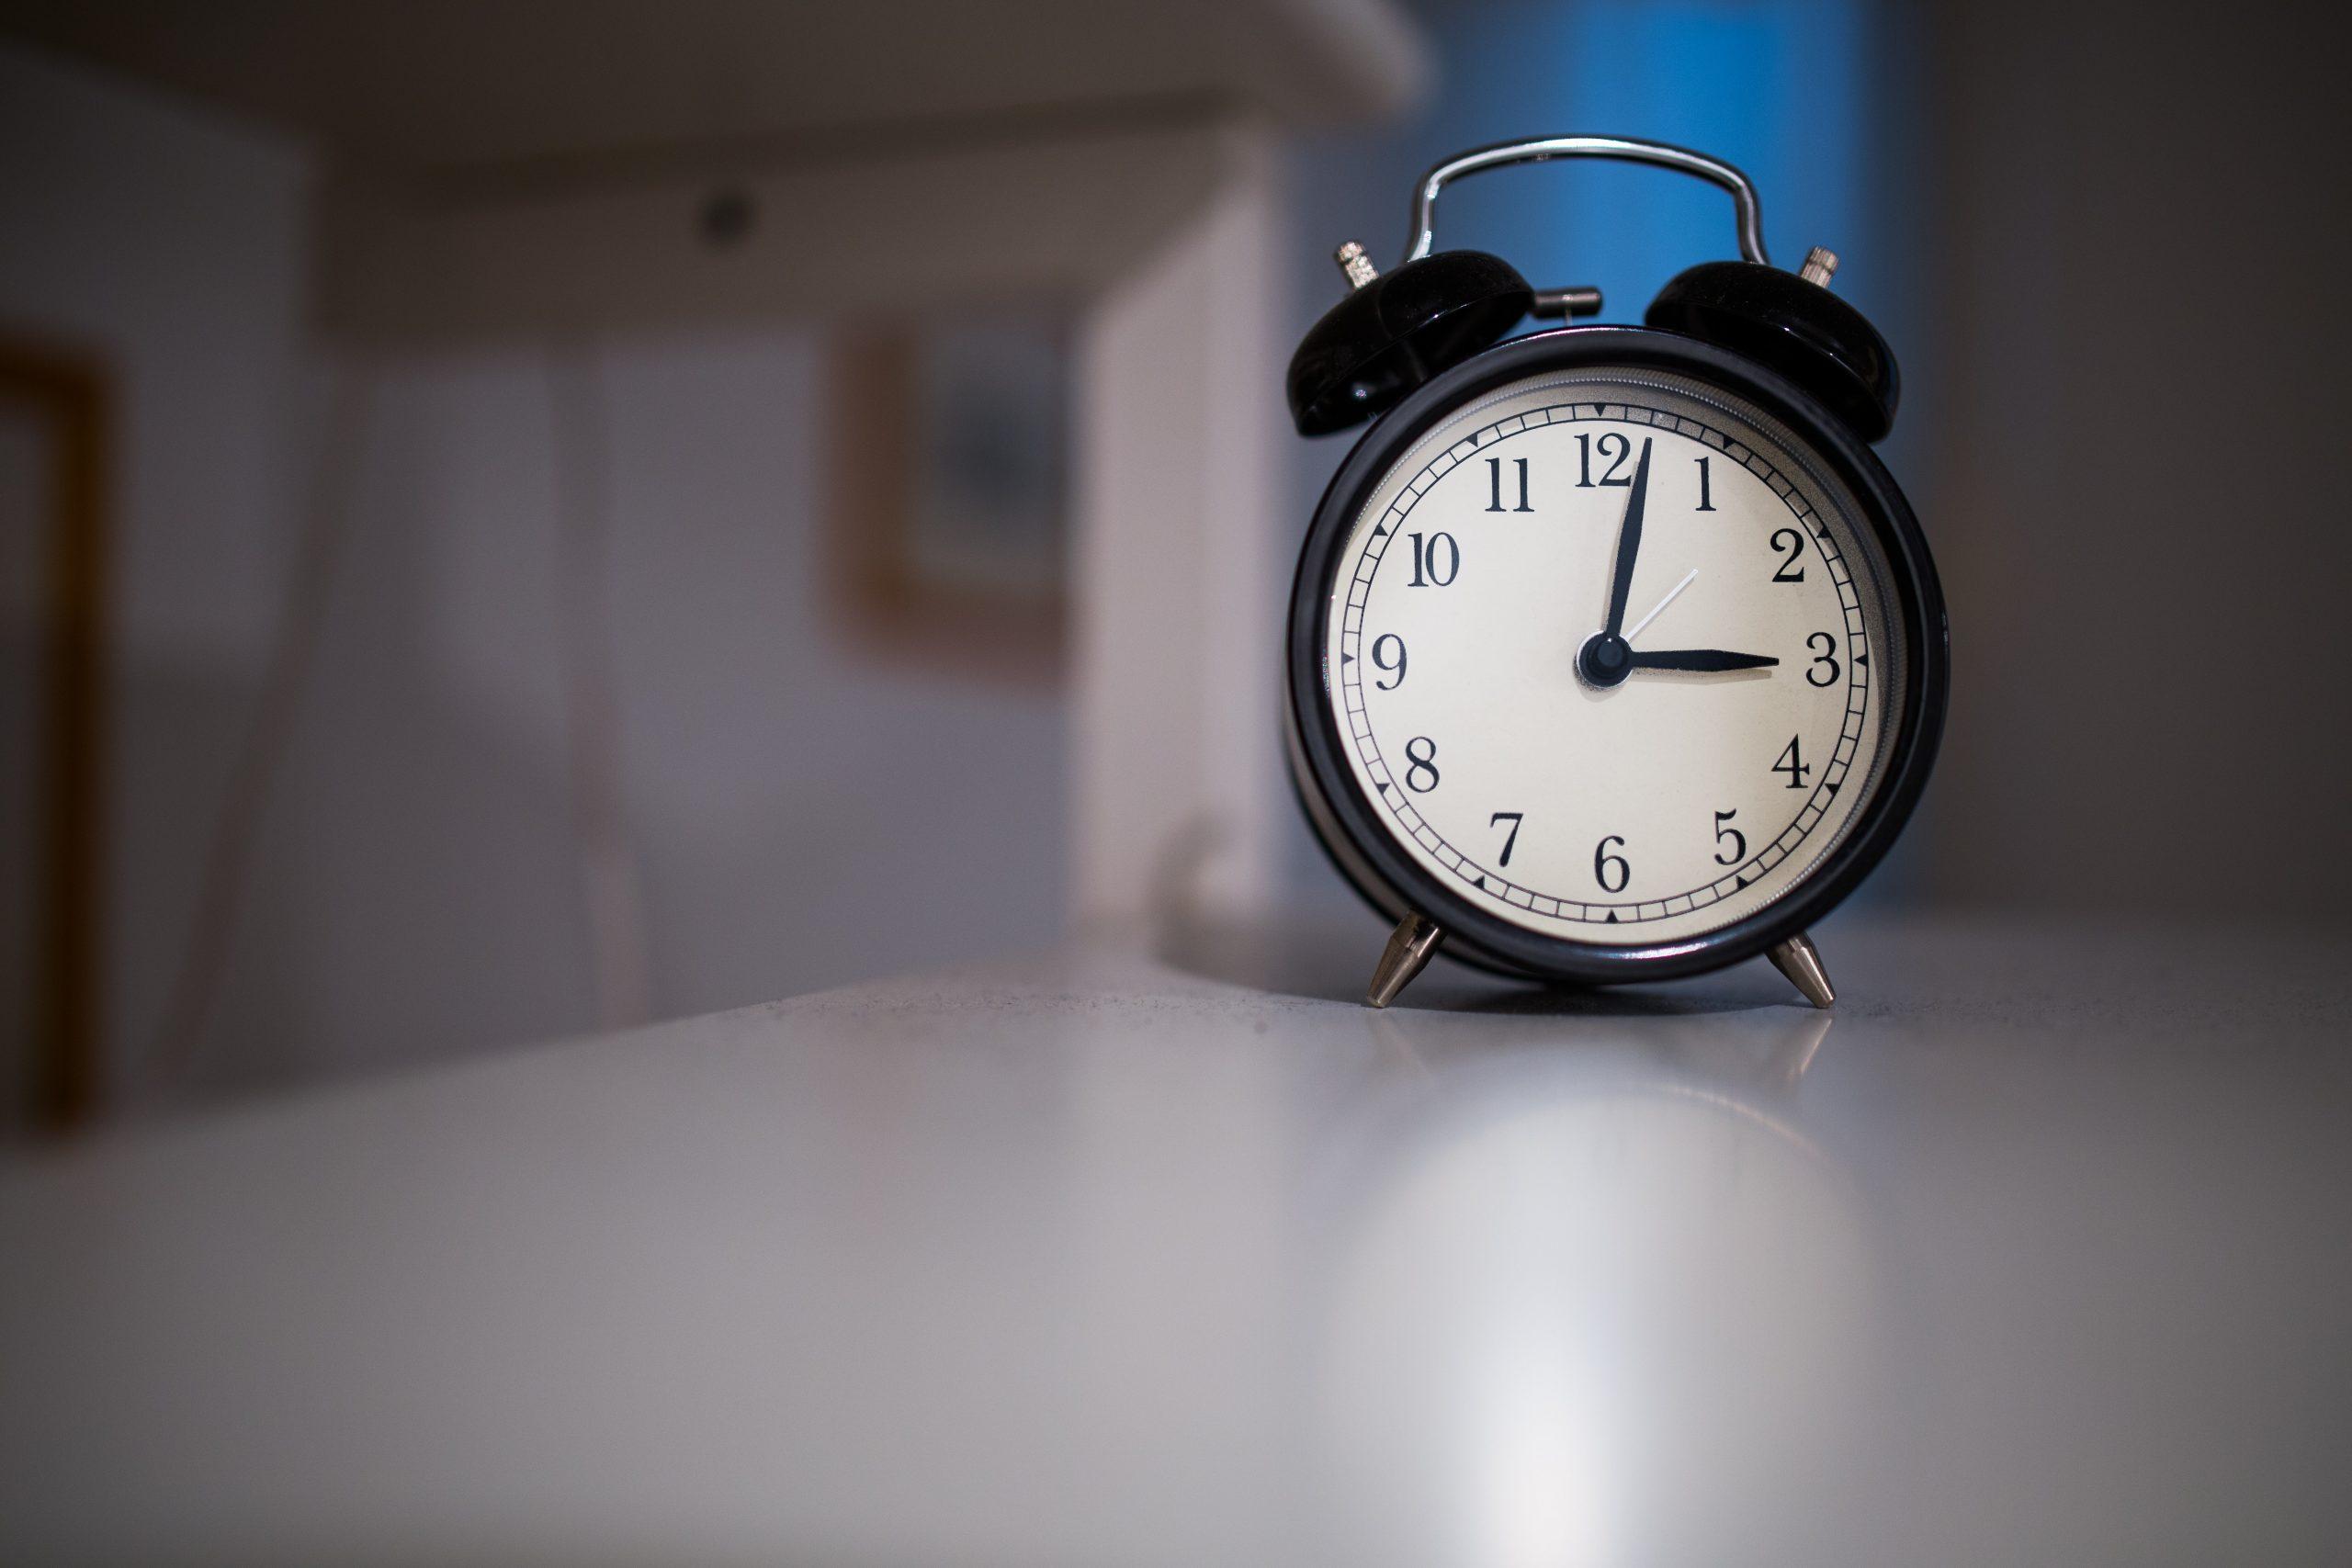 Pulkstenis galds